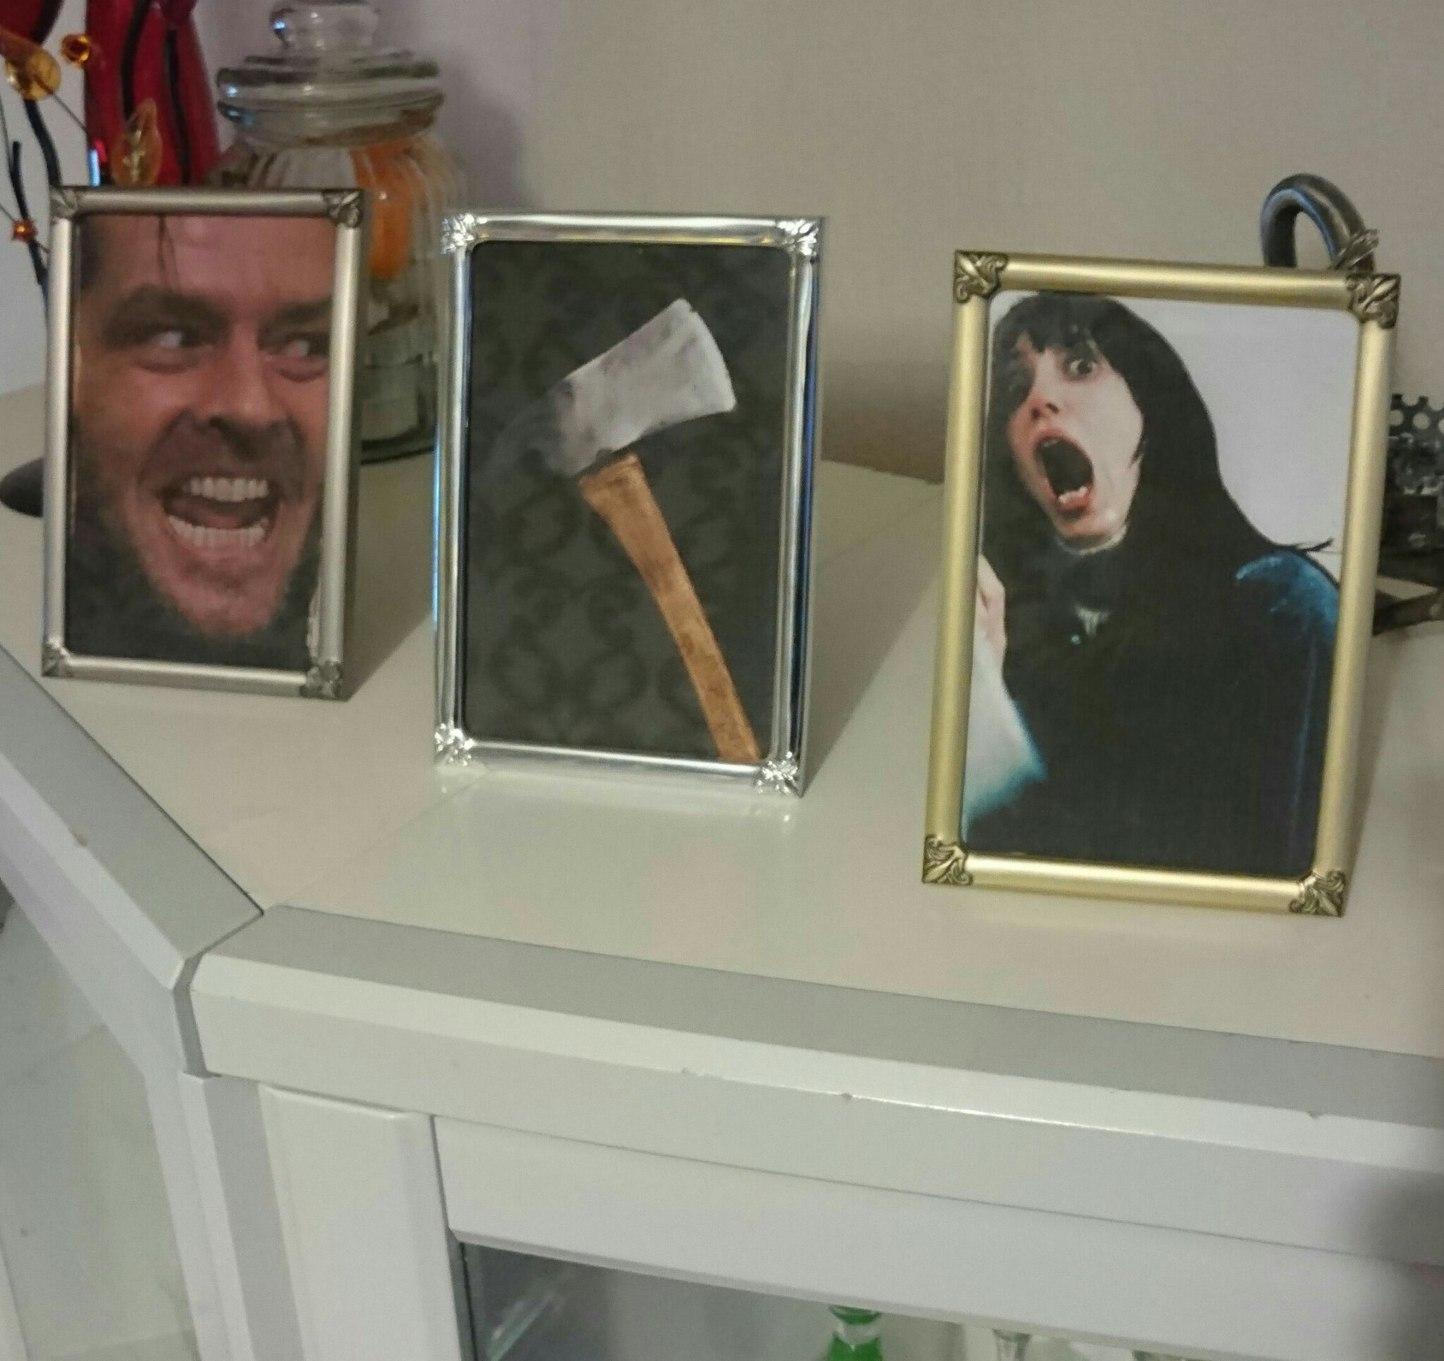 Just tought you guys would like some of my OC Halloween bullshittery - meme